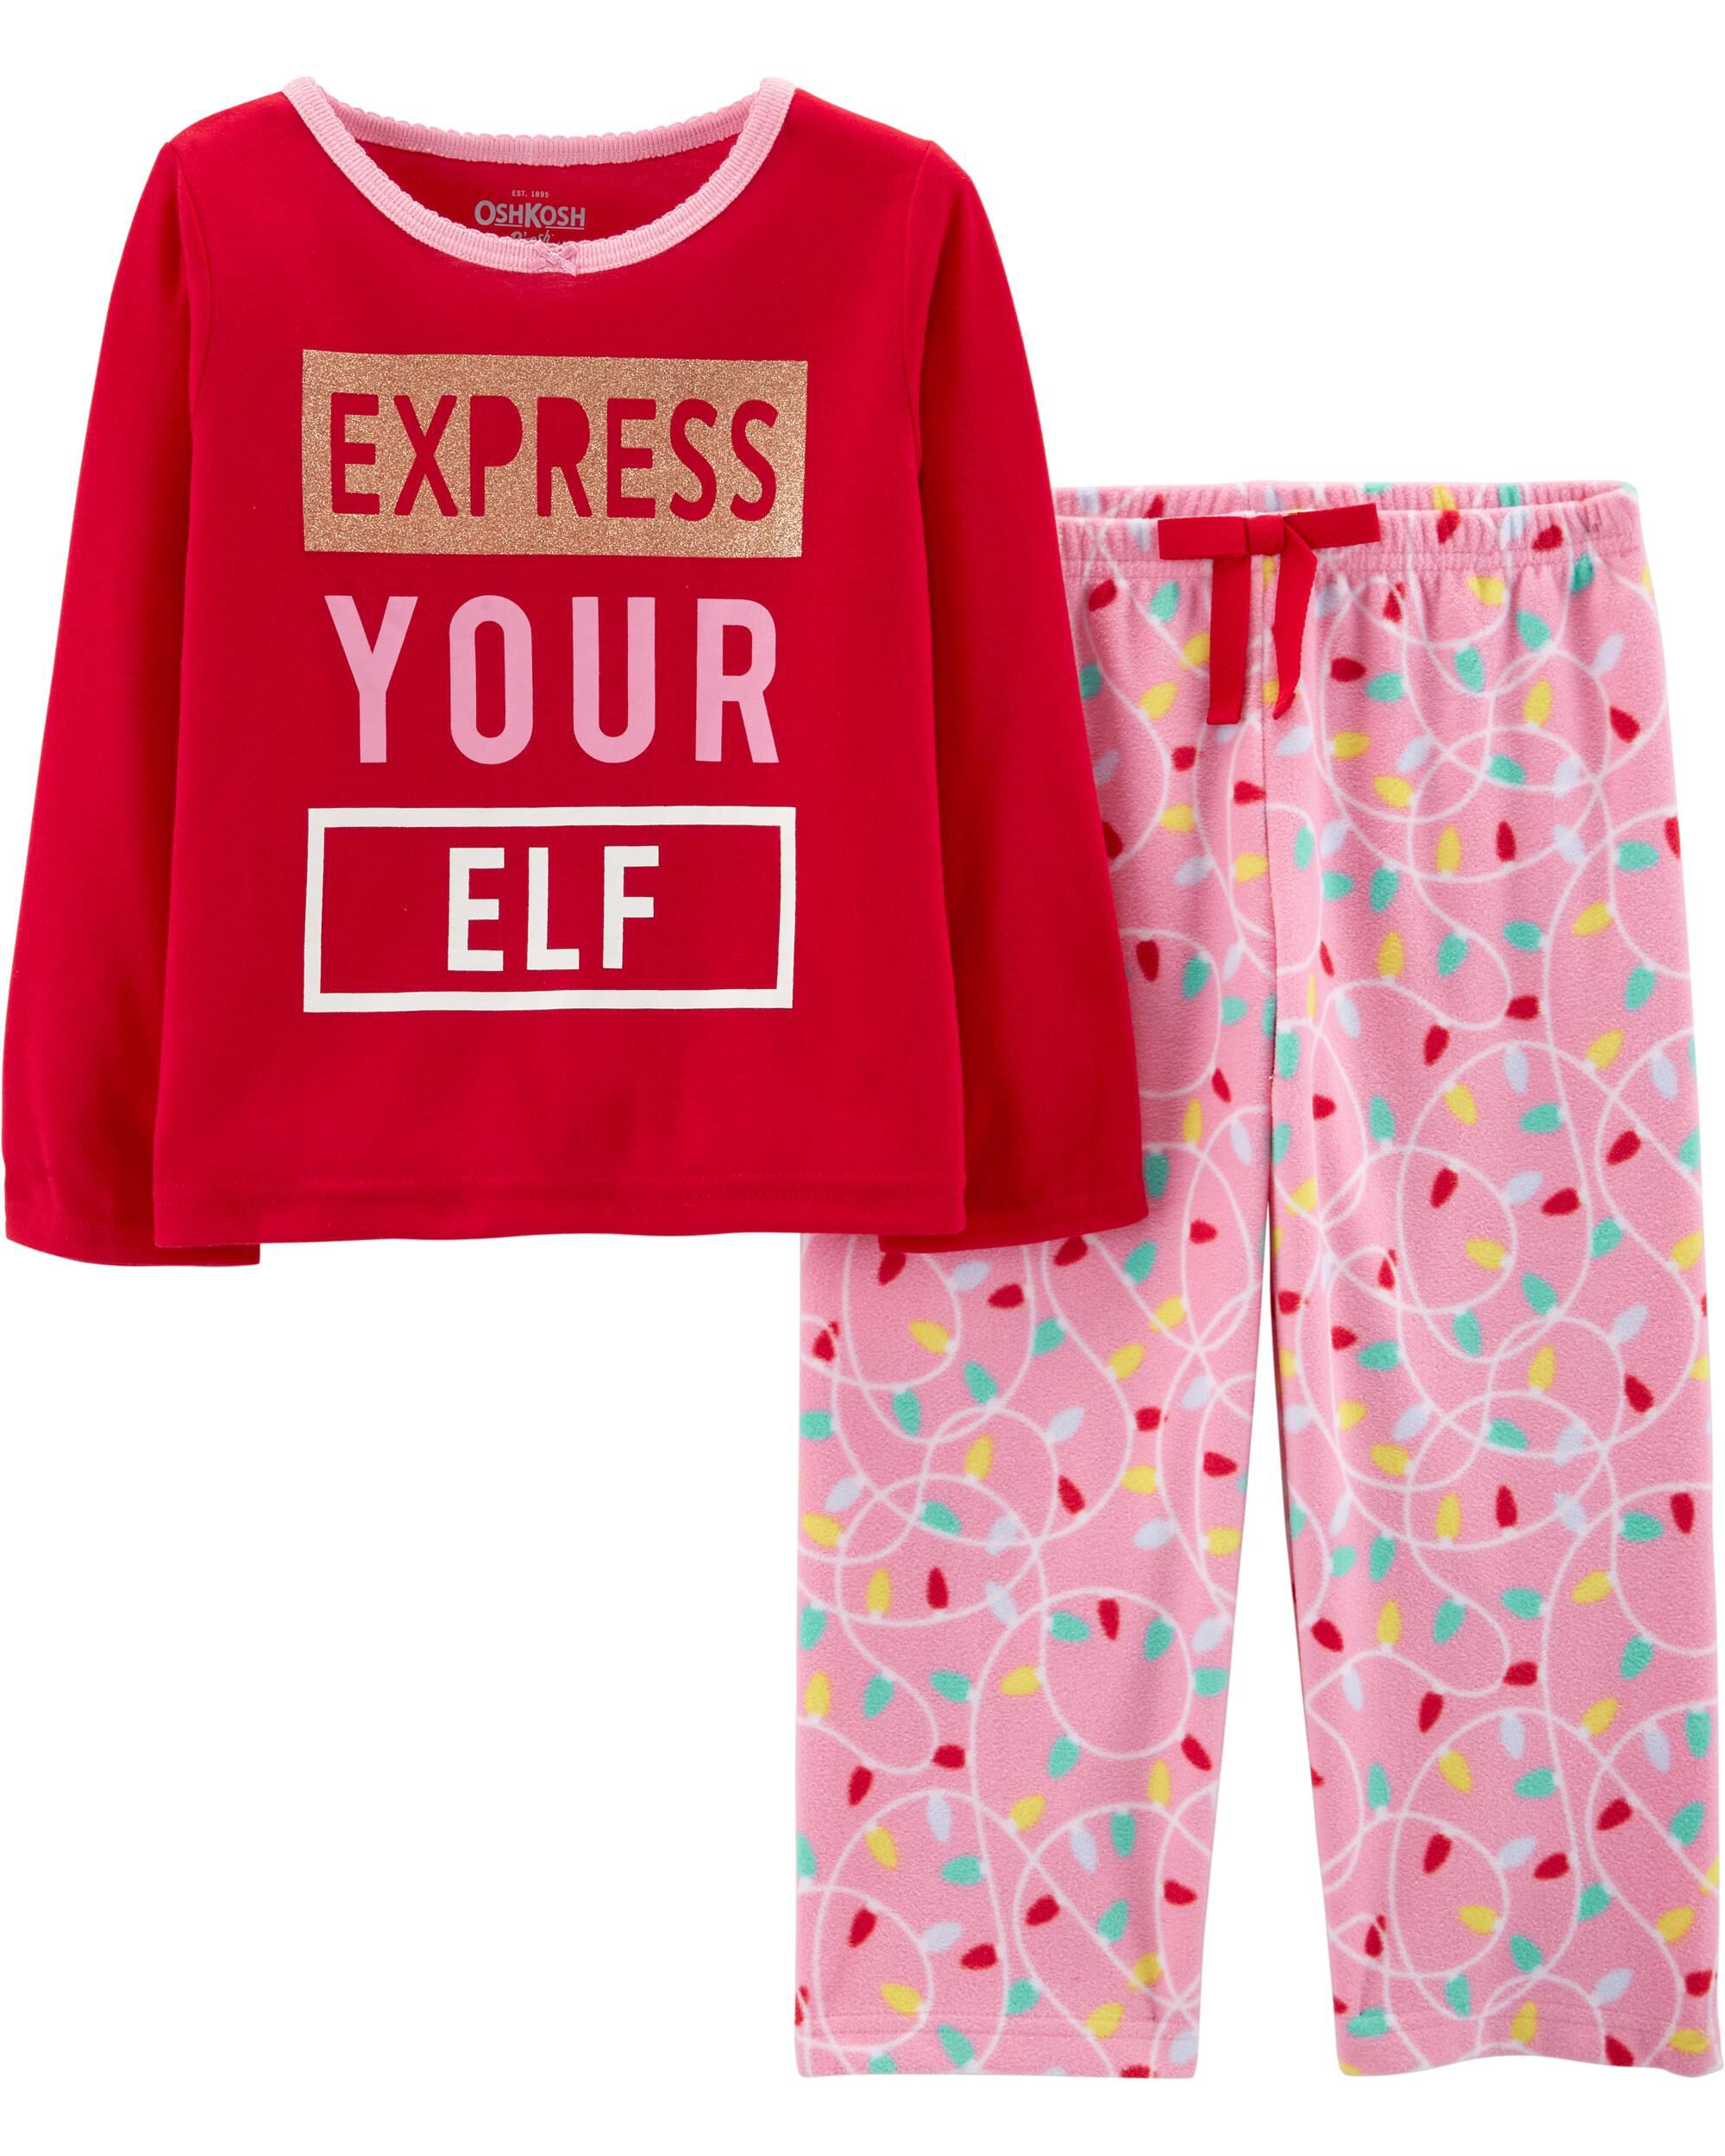 9dcc2093a 2-Piece Express Your Elf PJs